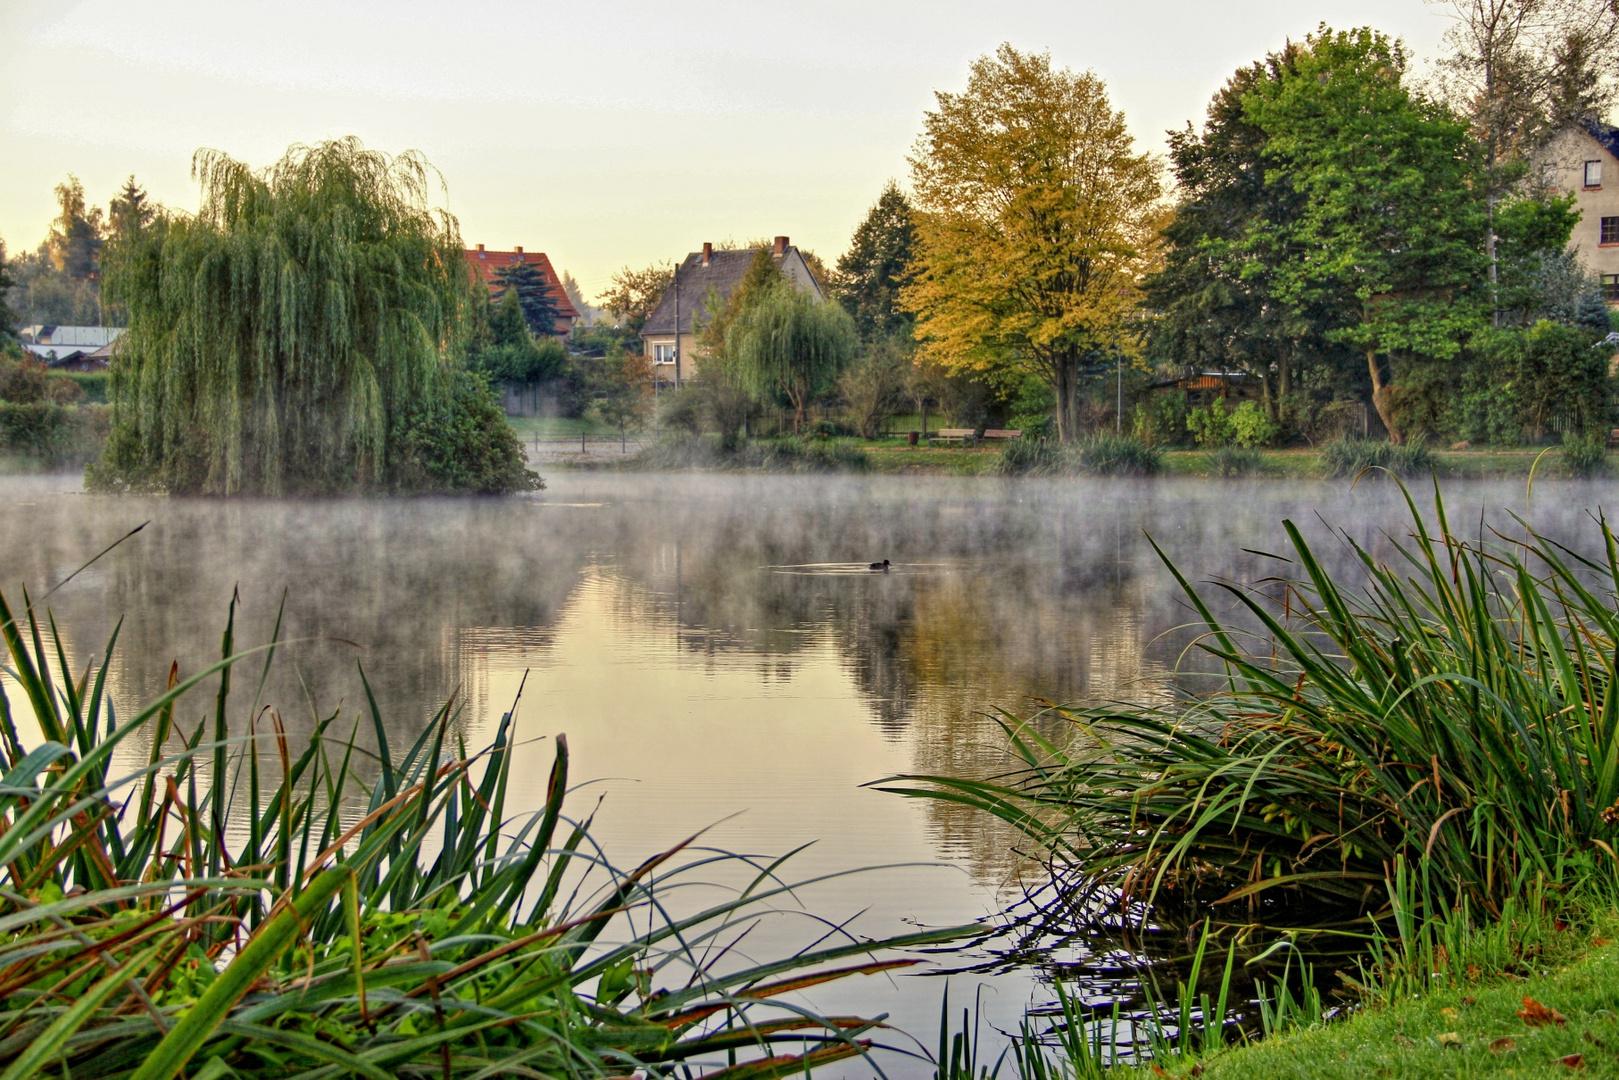 Teich am Morgen